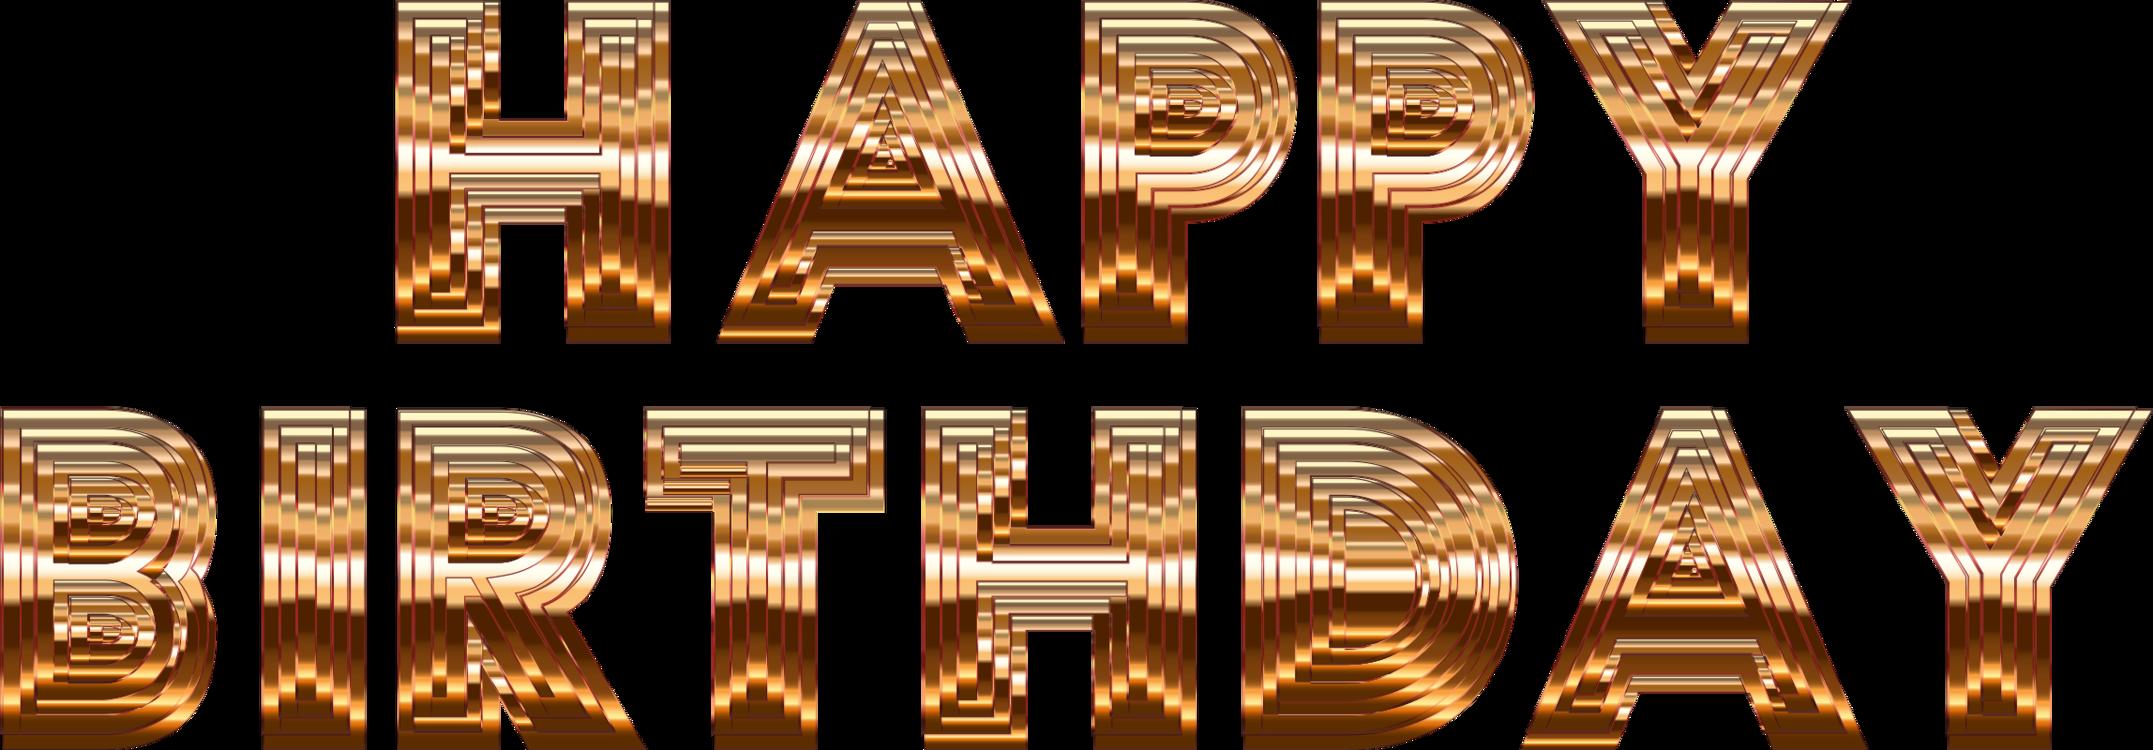 Copper,Gold,Text